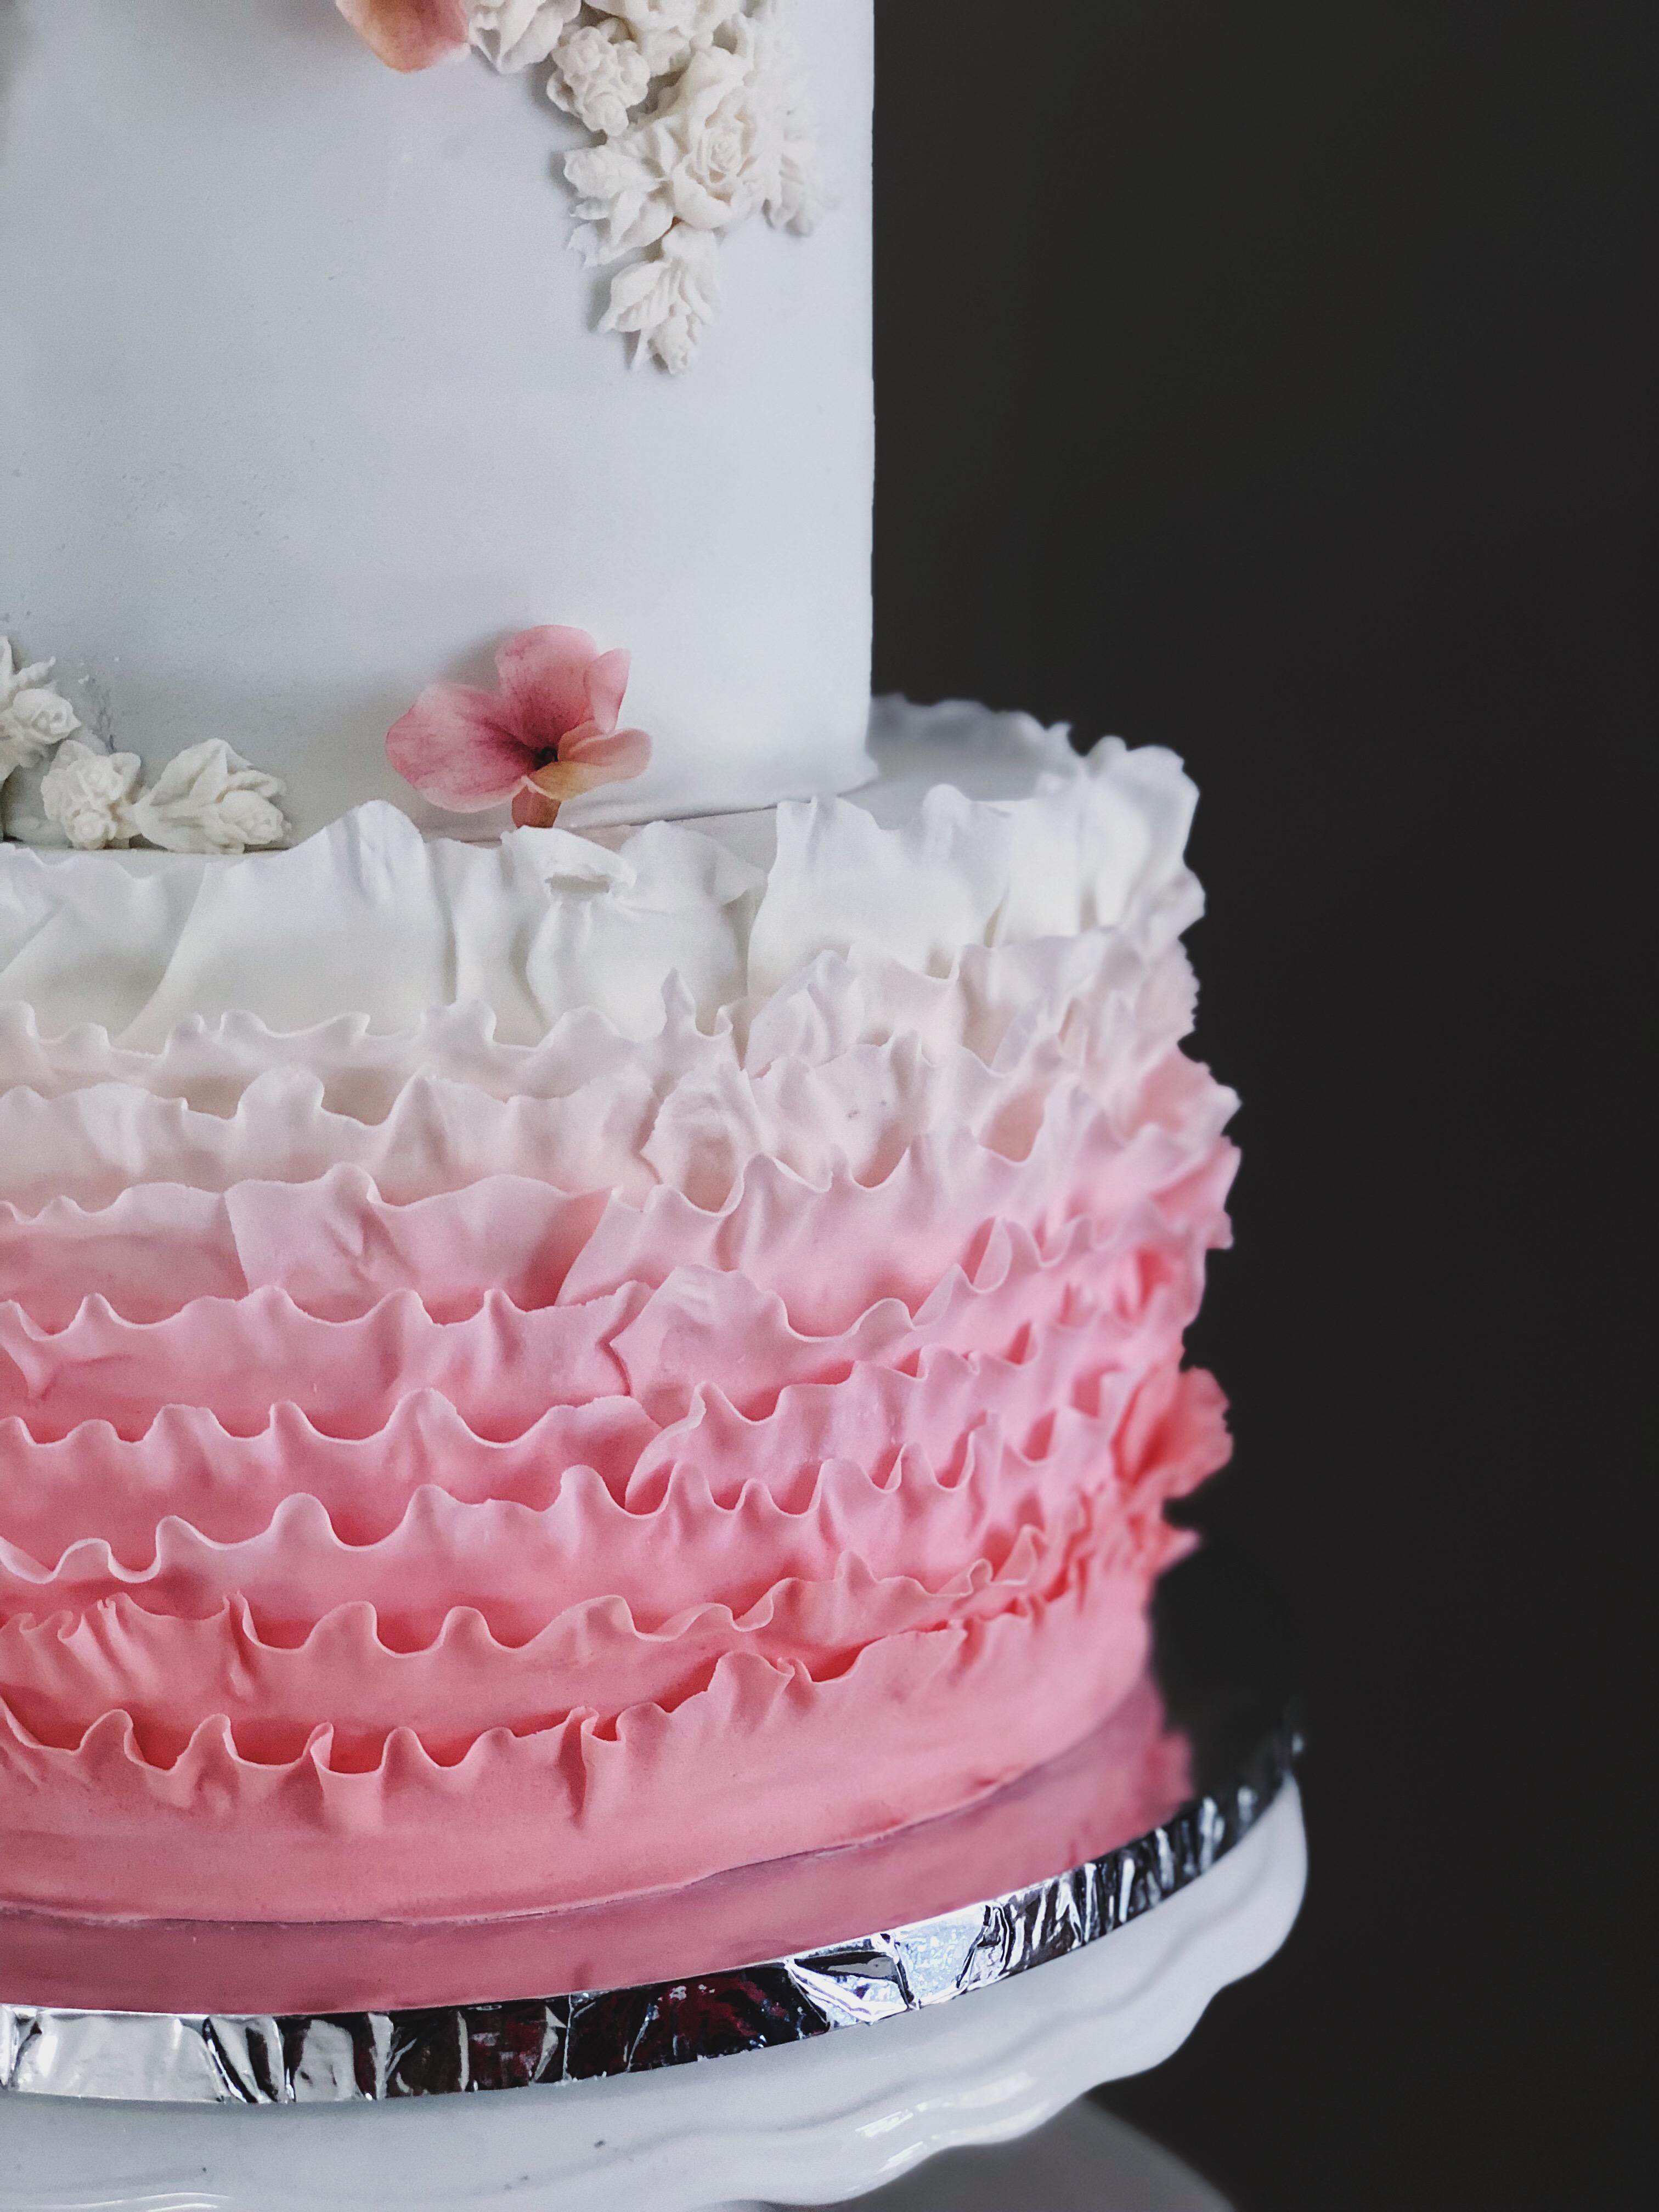 SUGAR FLOWER CAKES – The Sweet Spot